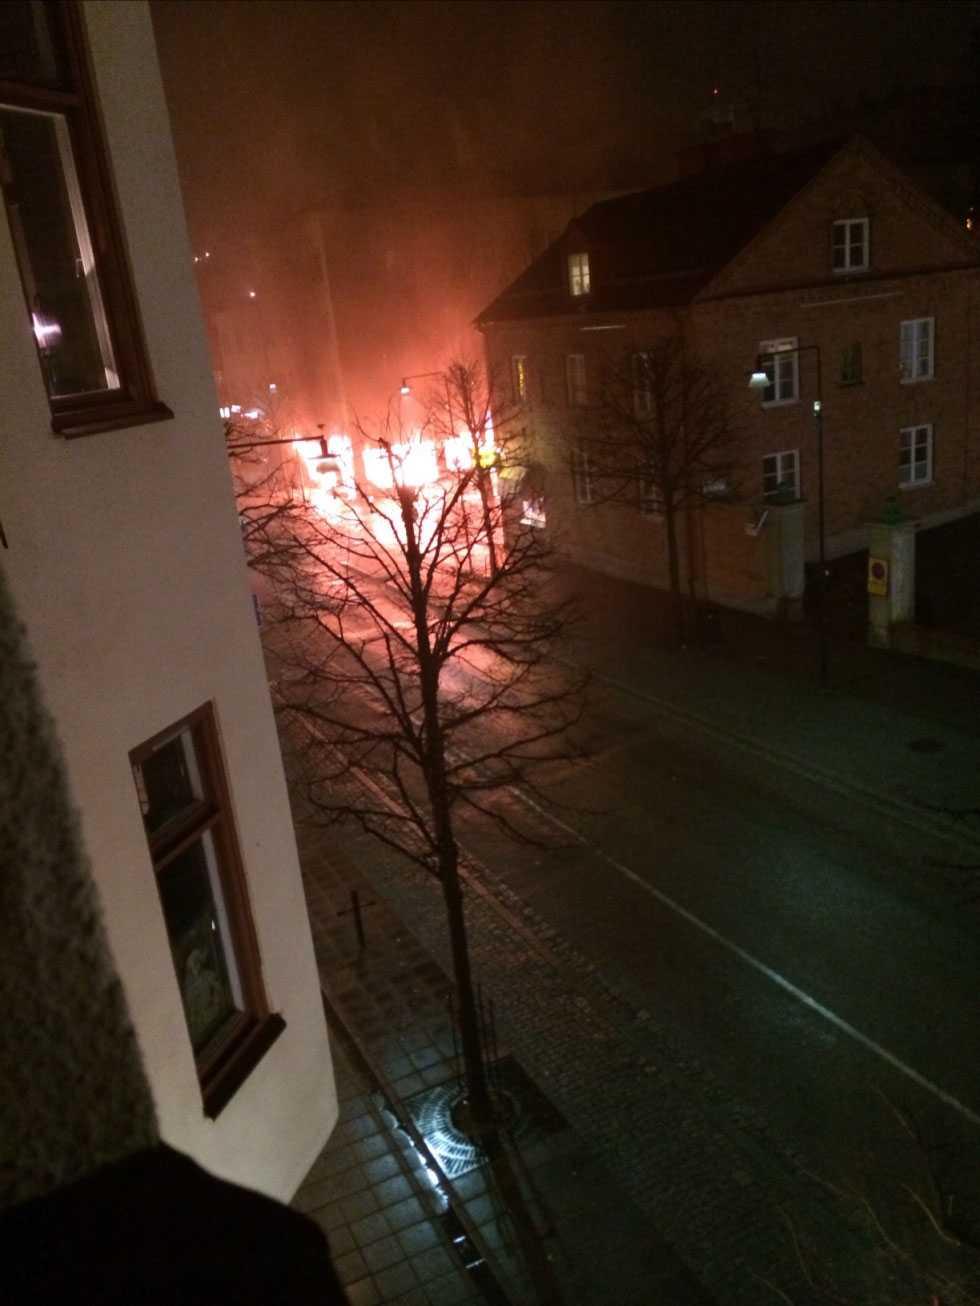 En kraftig brand utbröt i ett konditori i Sundbyberg, tidigt på fredagsmorgonen.